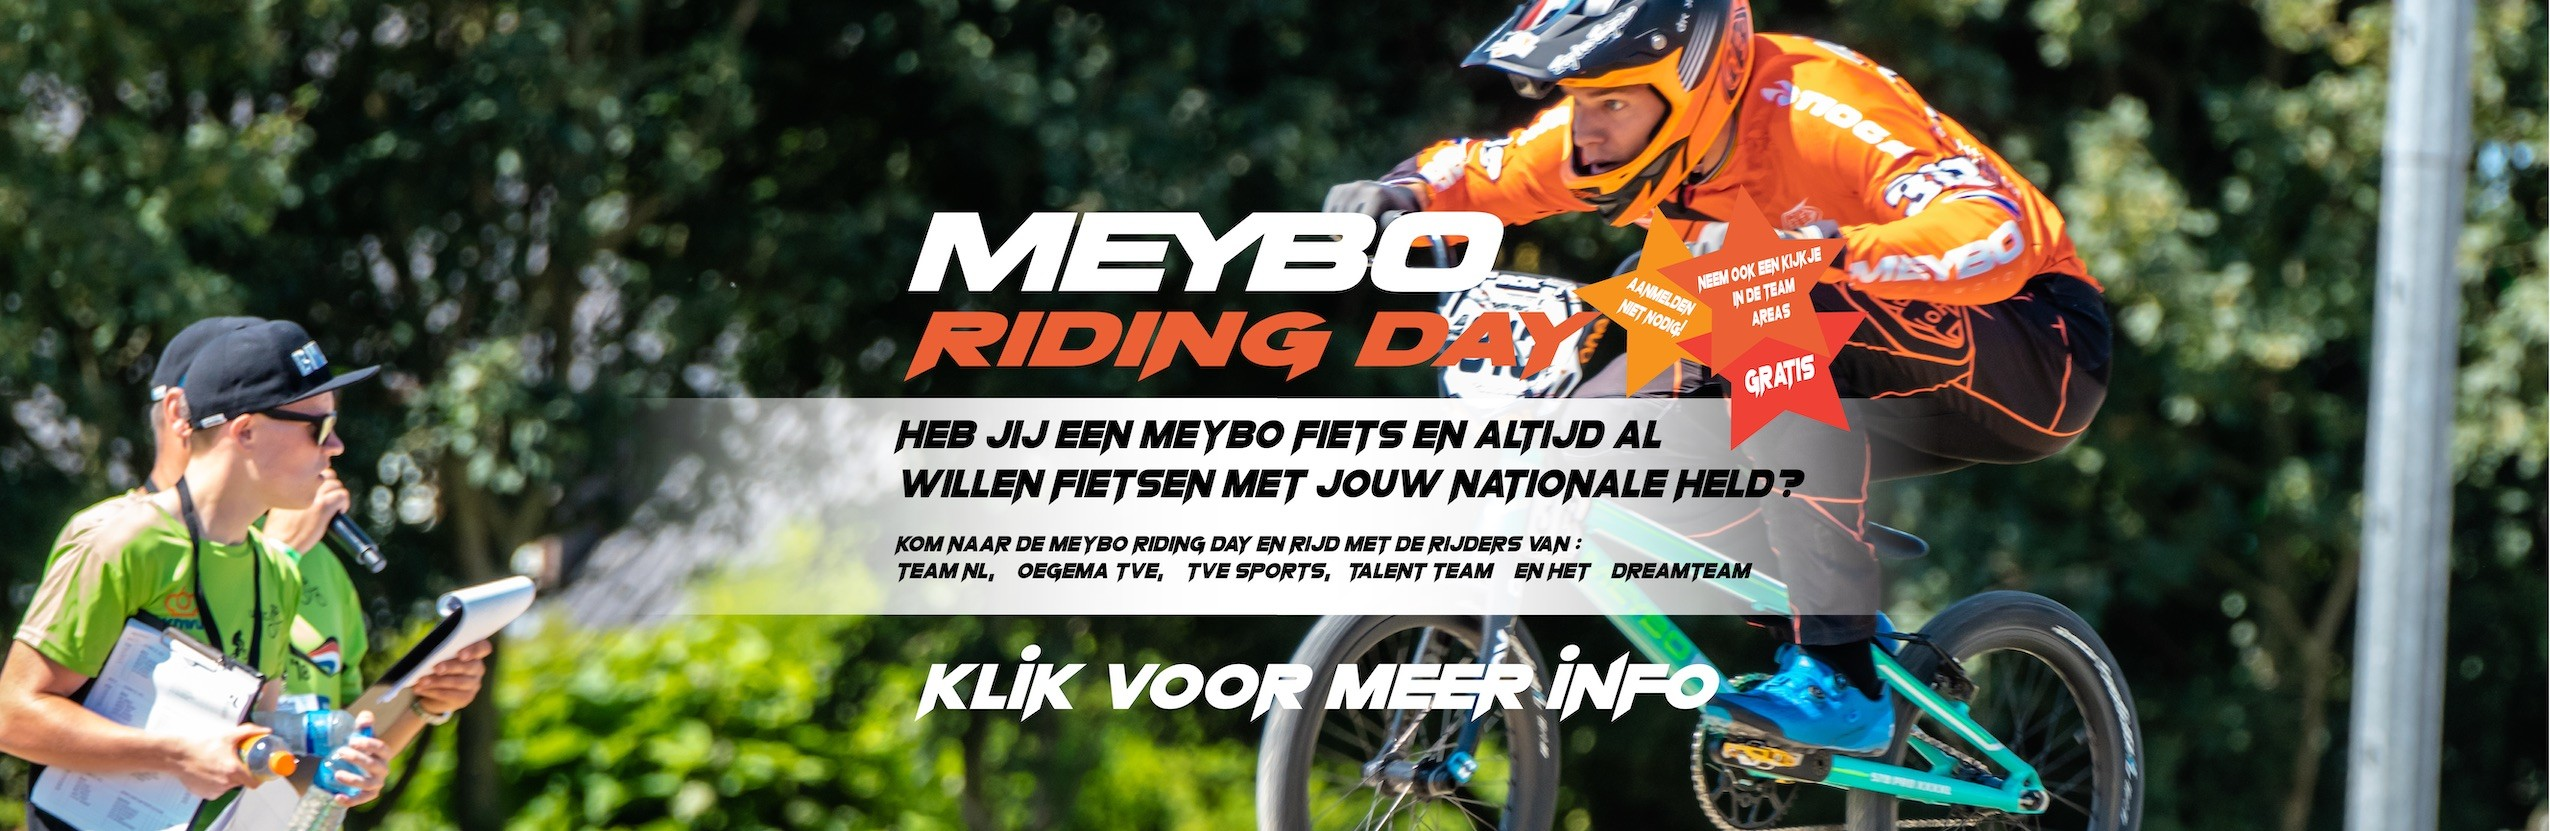 Meybo Riding Day